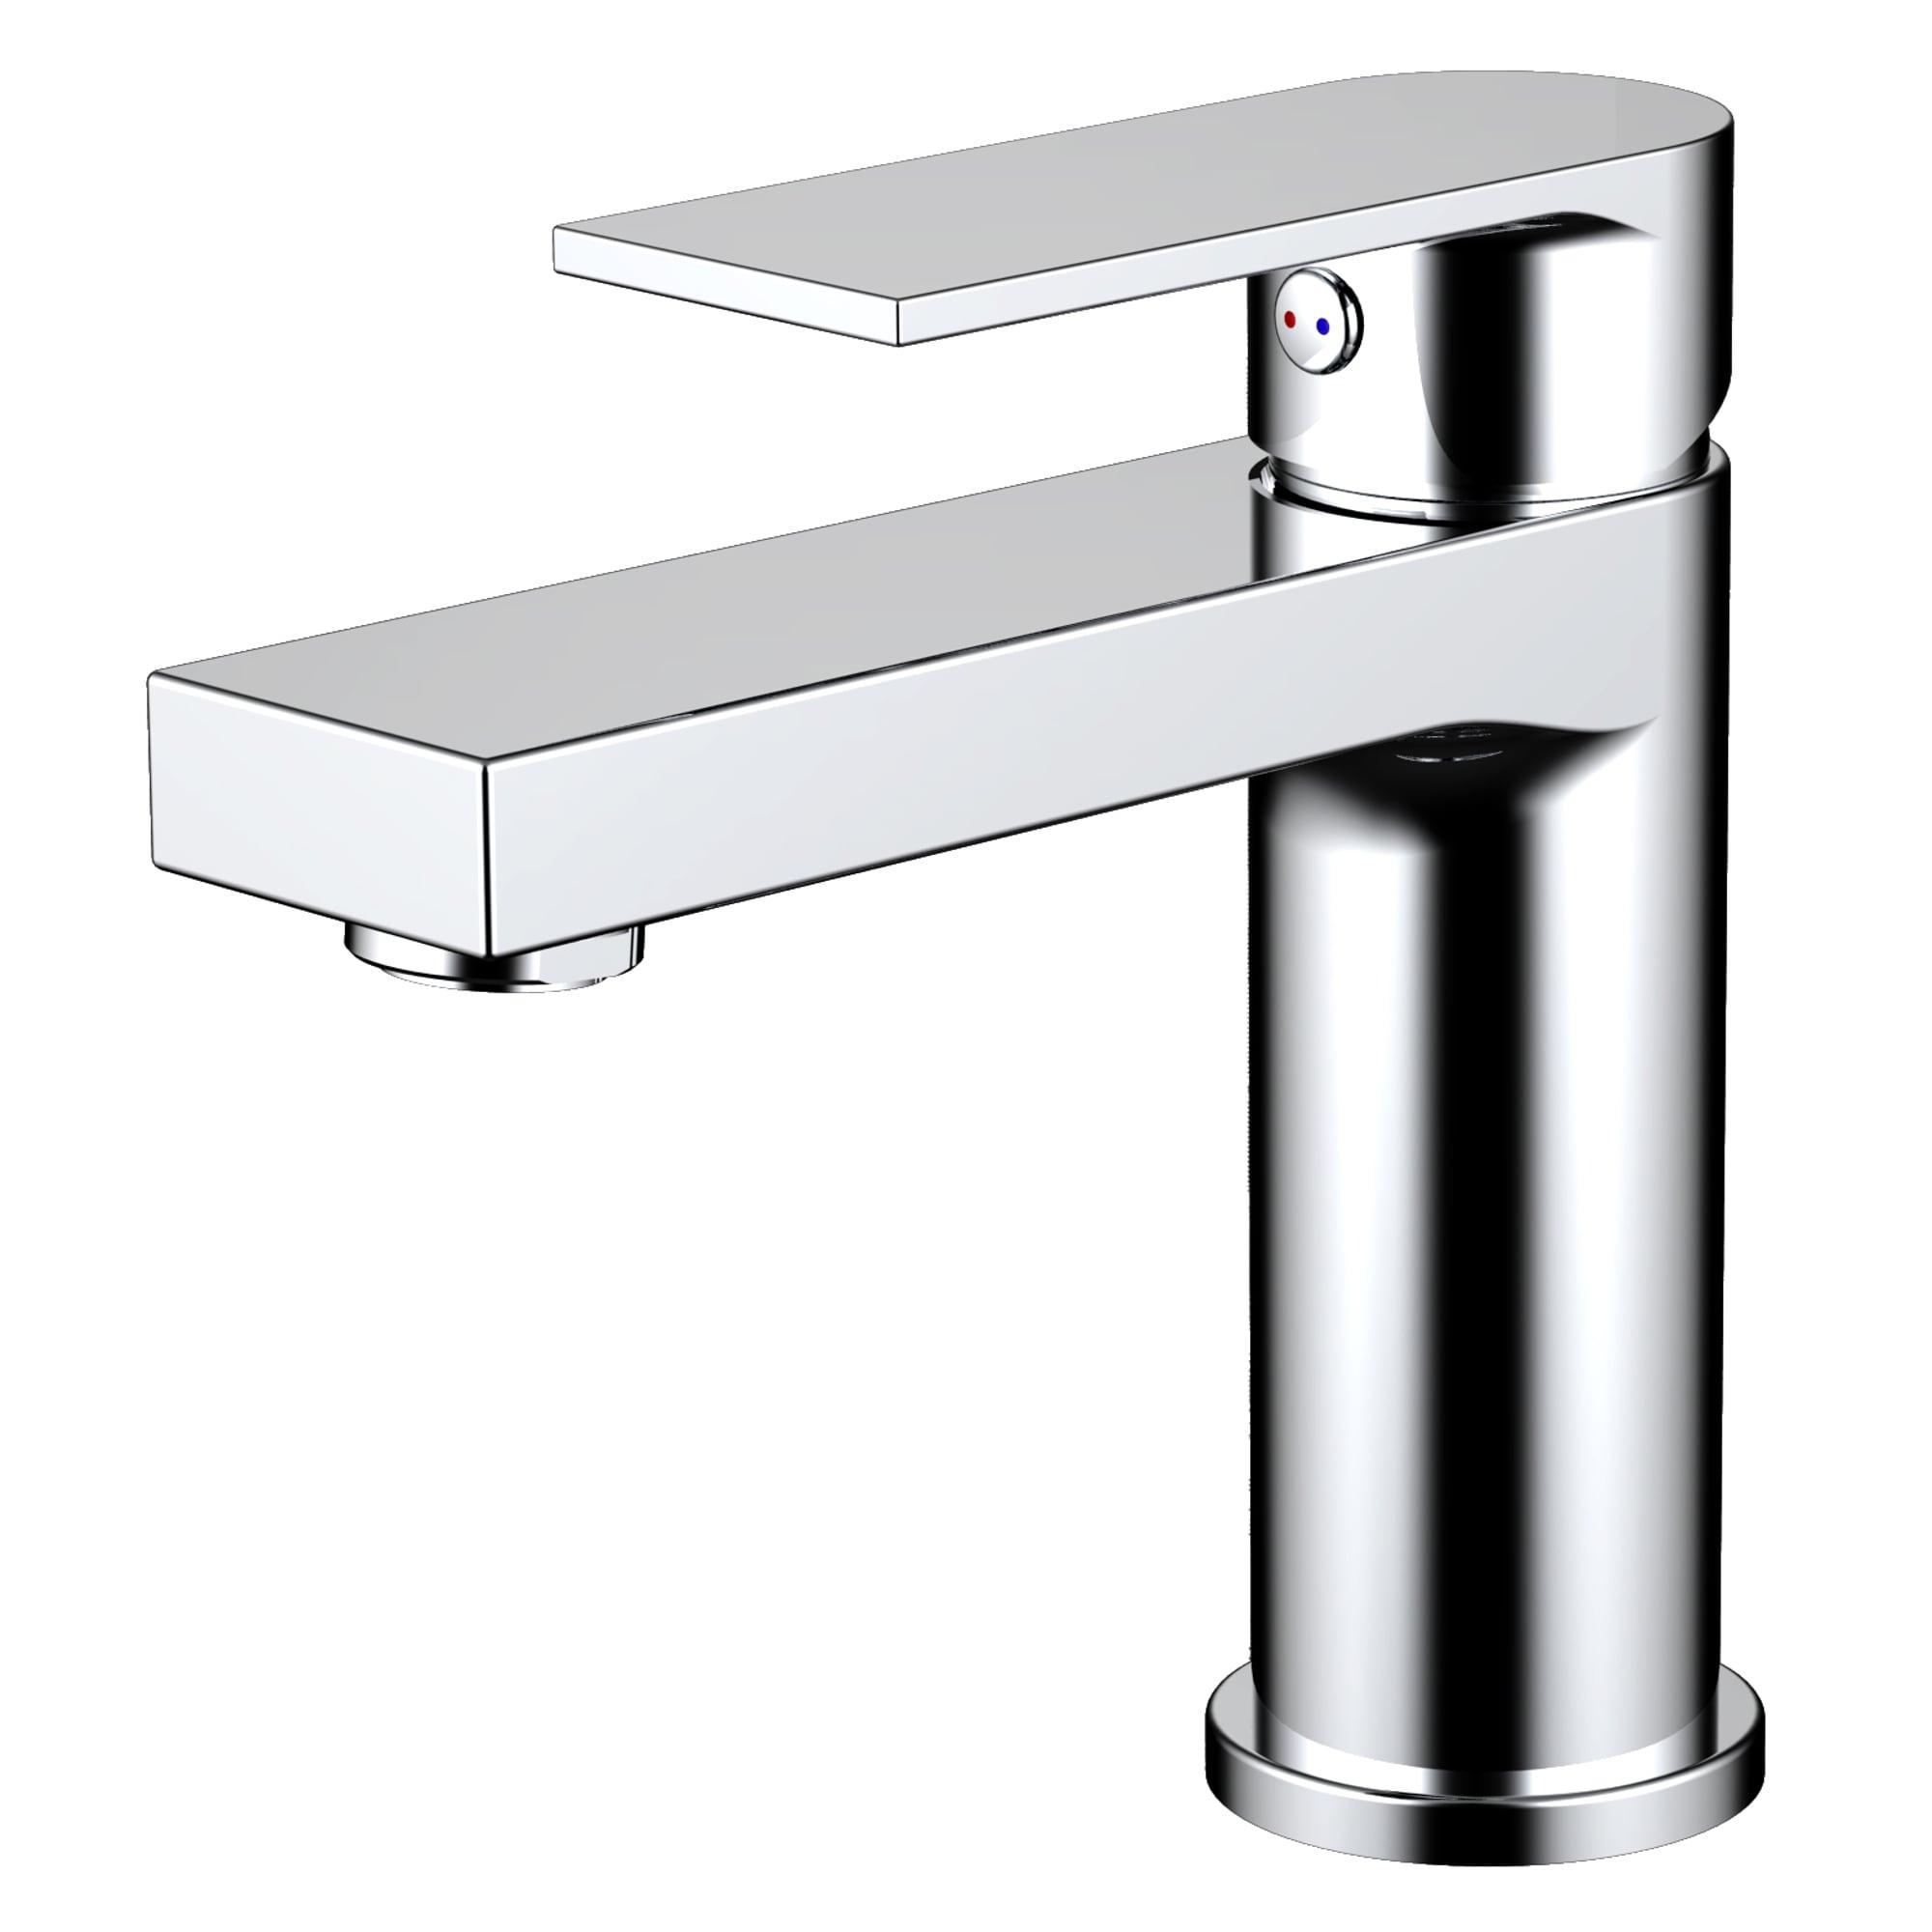 EVIVA Pure Single Handle Bathroom Sink Faucet (Chrome) - Free ...